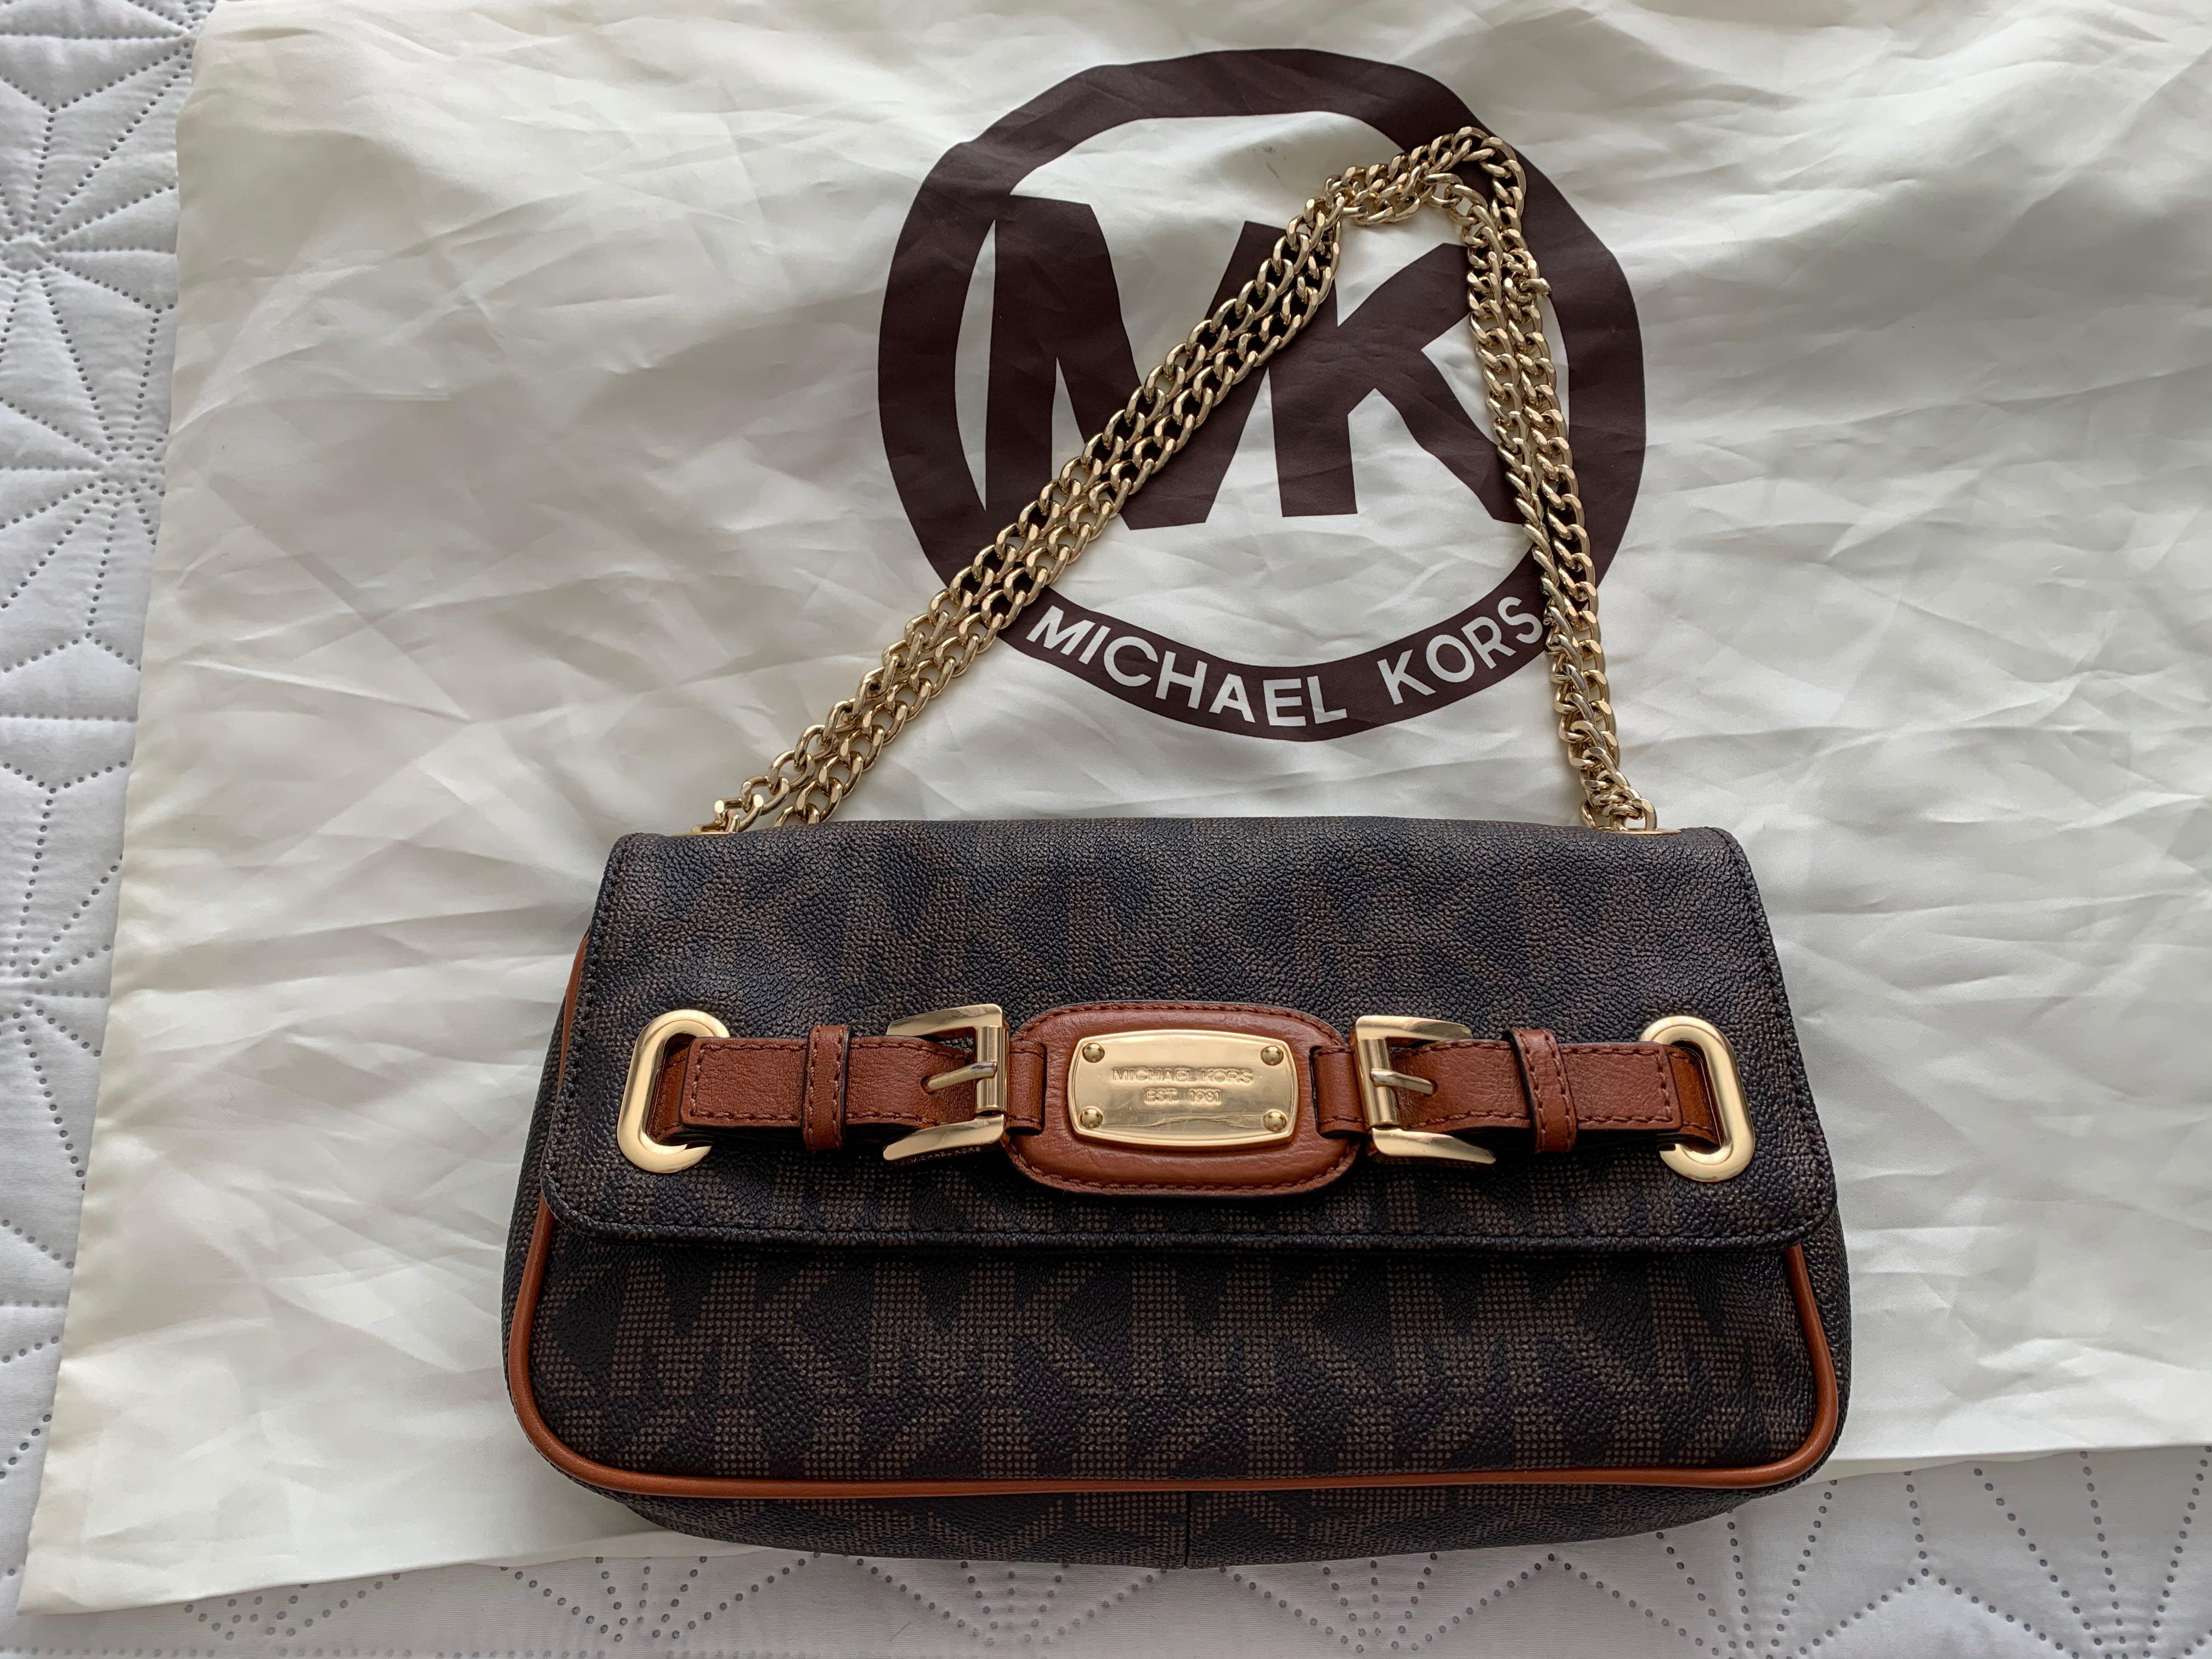 Michael Kors- clutch bag purse